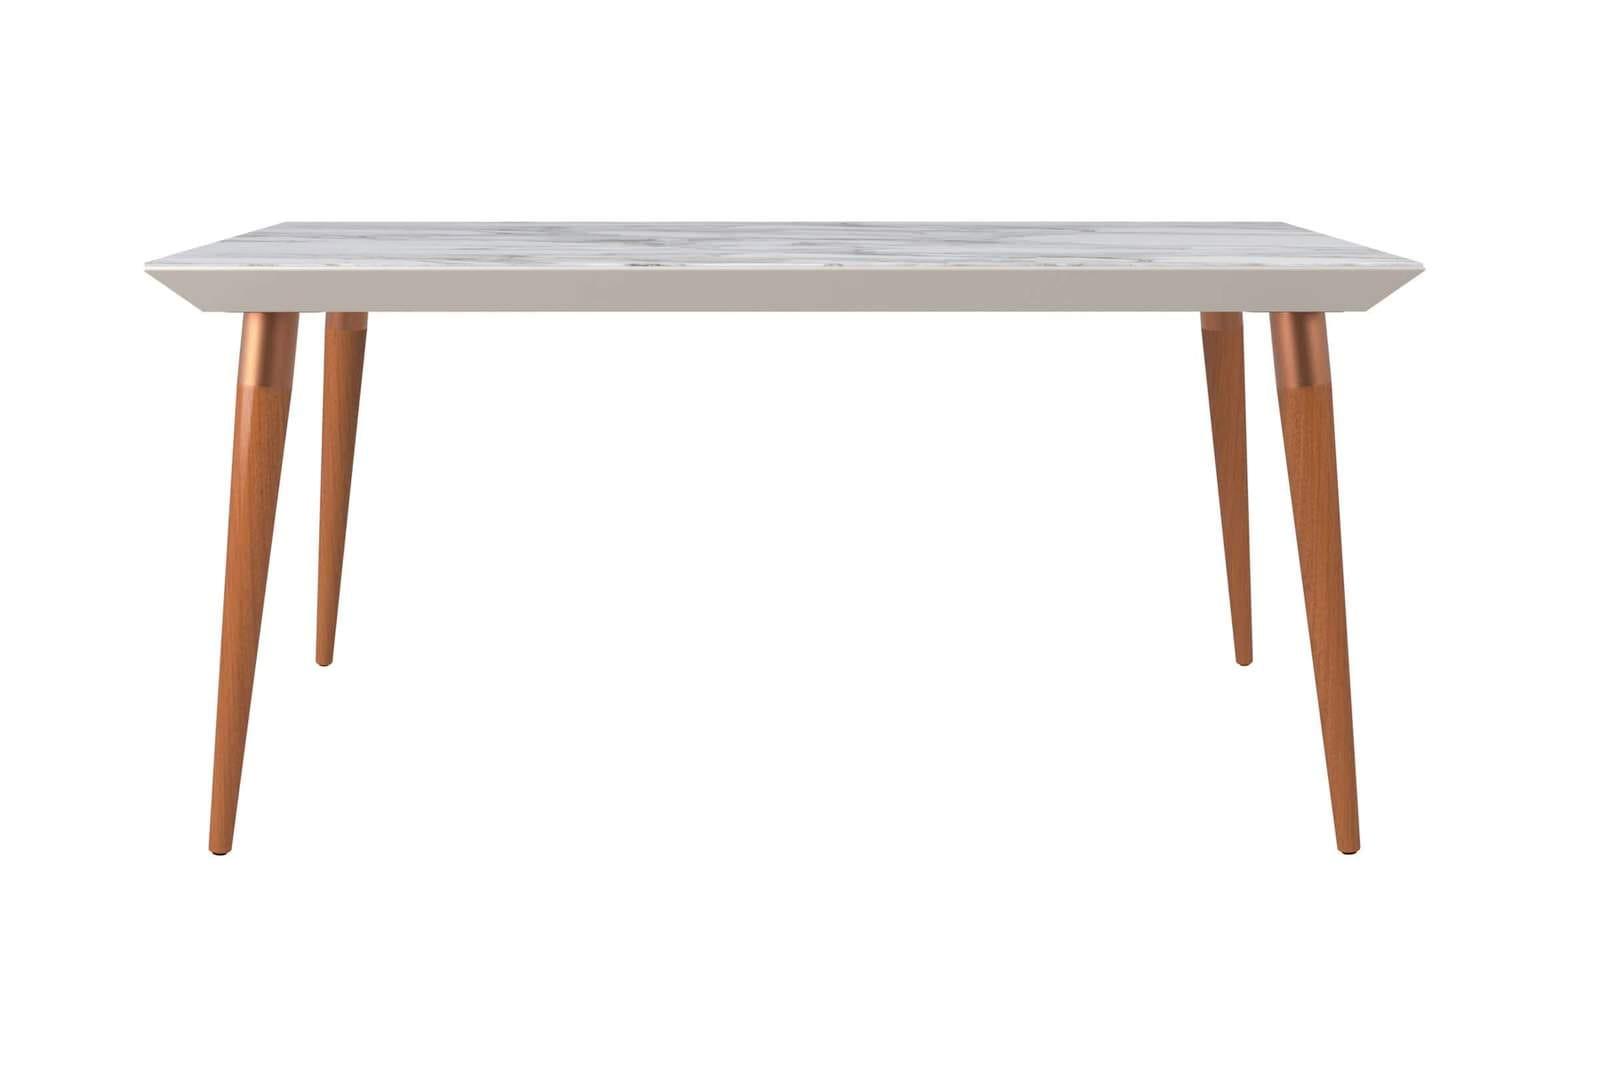 Peachy Utopia Modern 62 99 Inch Off White Maple Cream Rectangular Dining Table By Manhattan Comfort Uwap Interior Chair Design Uwaporg